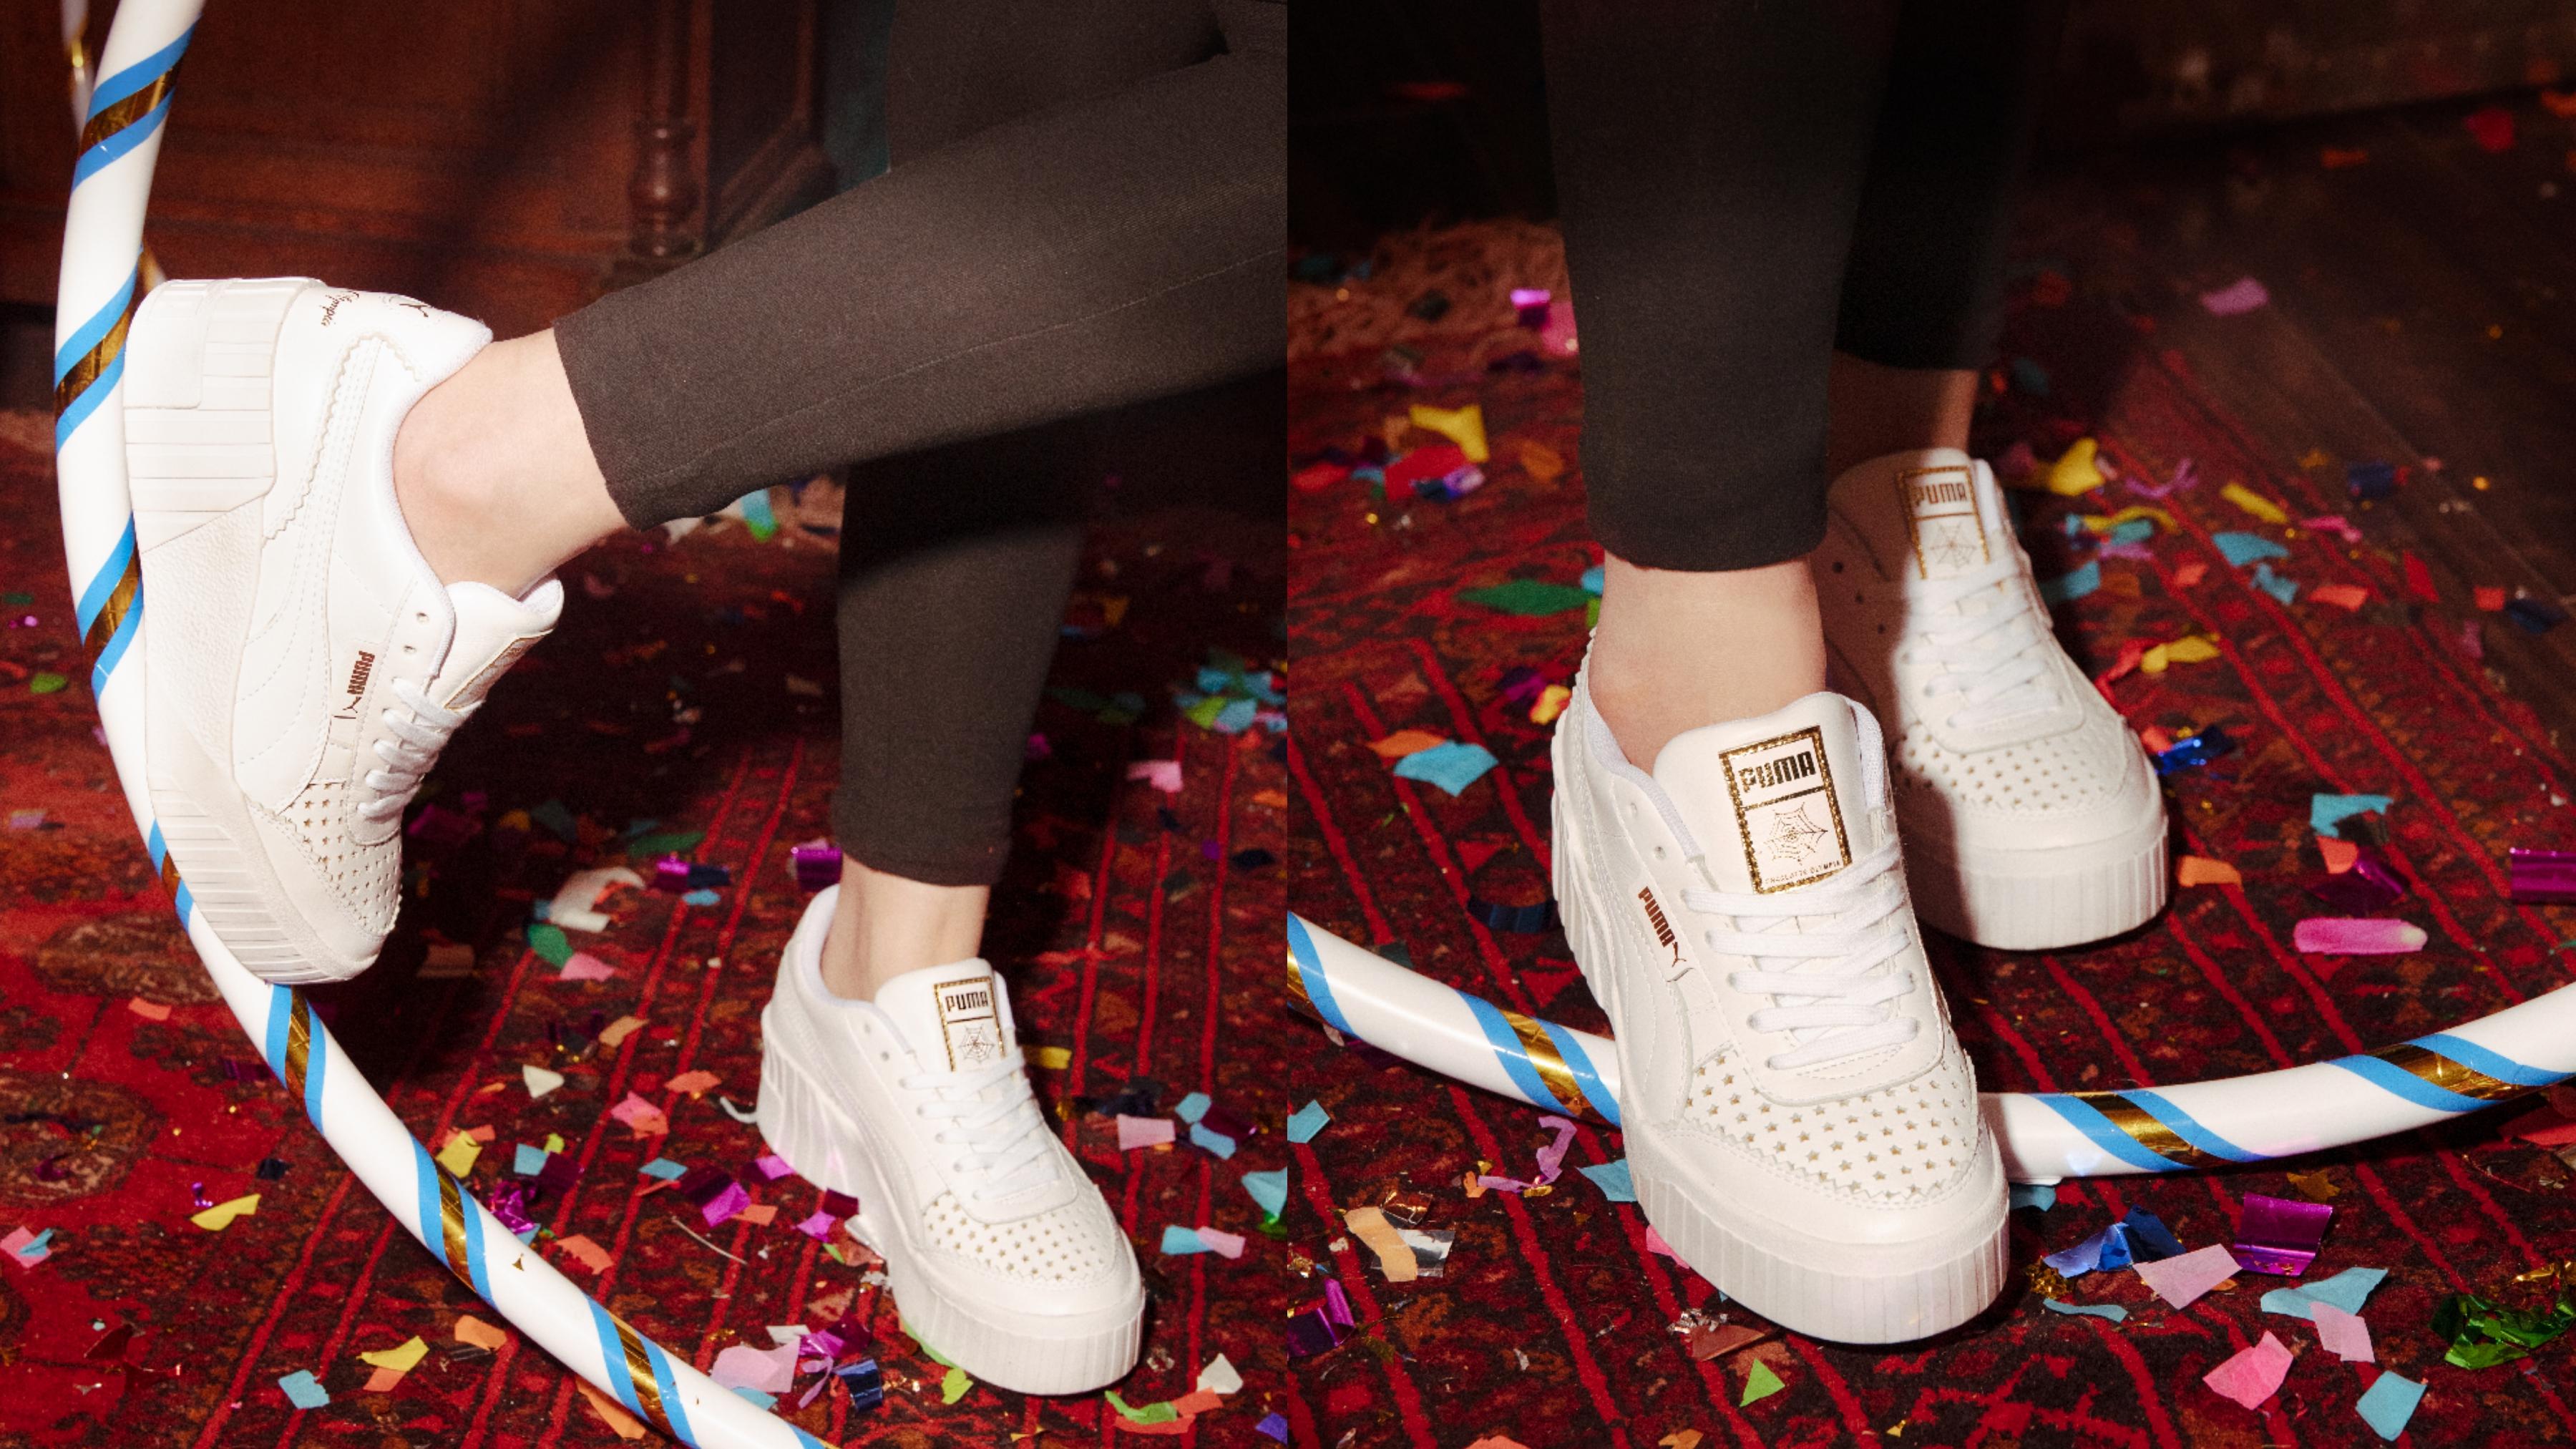 PUMA Cali Wedge CHARLOTTE,NT$4280 純白高級皮革搭配金色星星點綴鞋面網眼,時尚超百搭